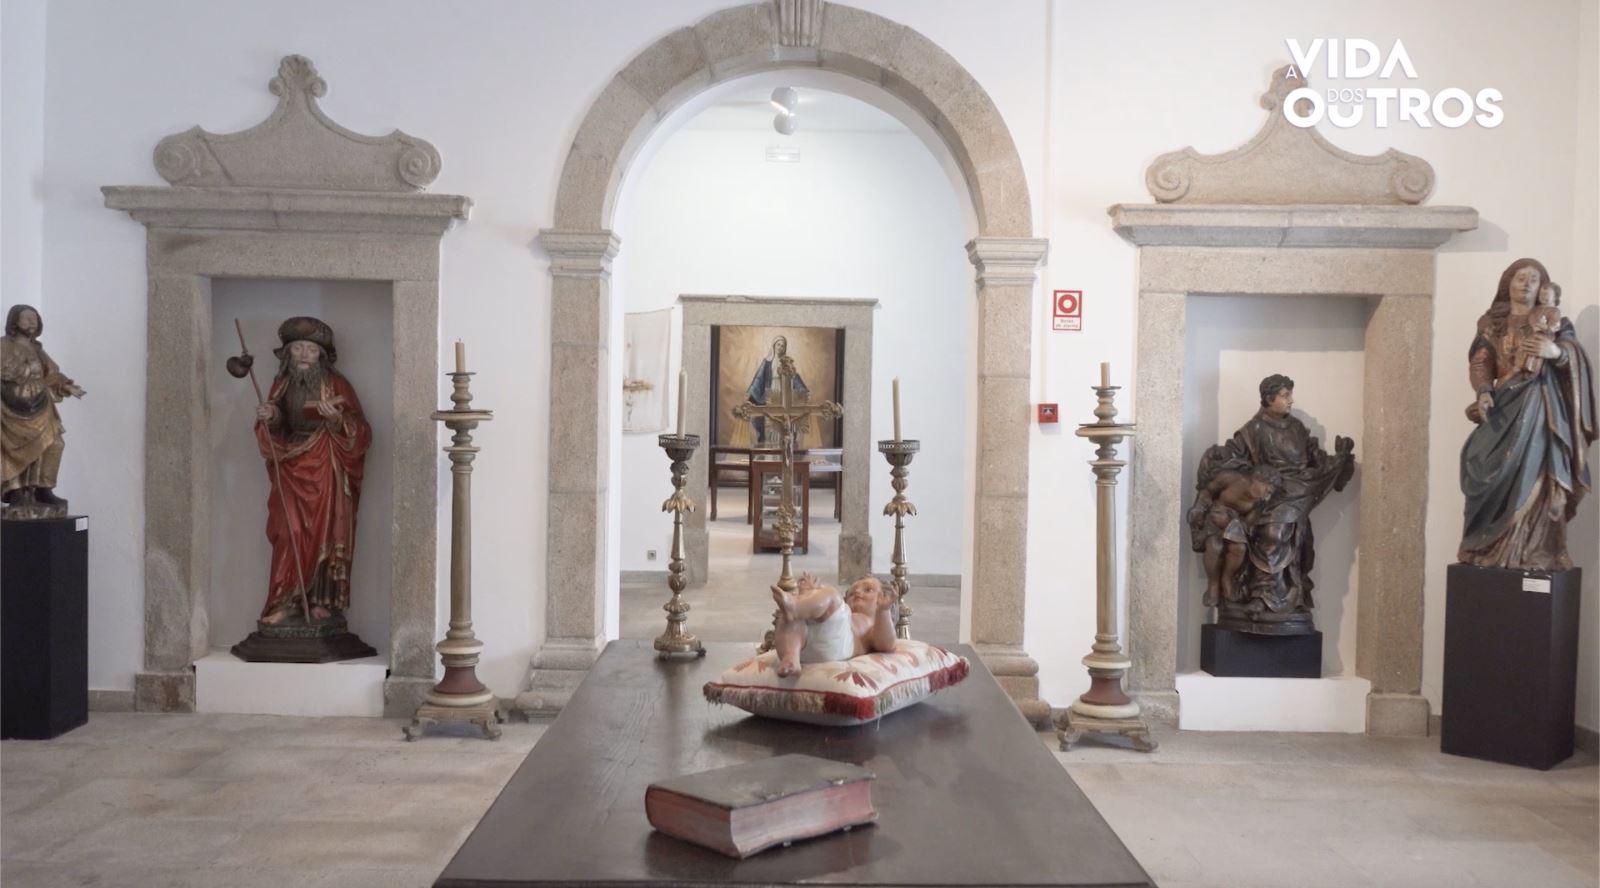 A Vida dos Outros | Núcleo museológico da Misericórdia de Castelo Branco